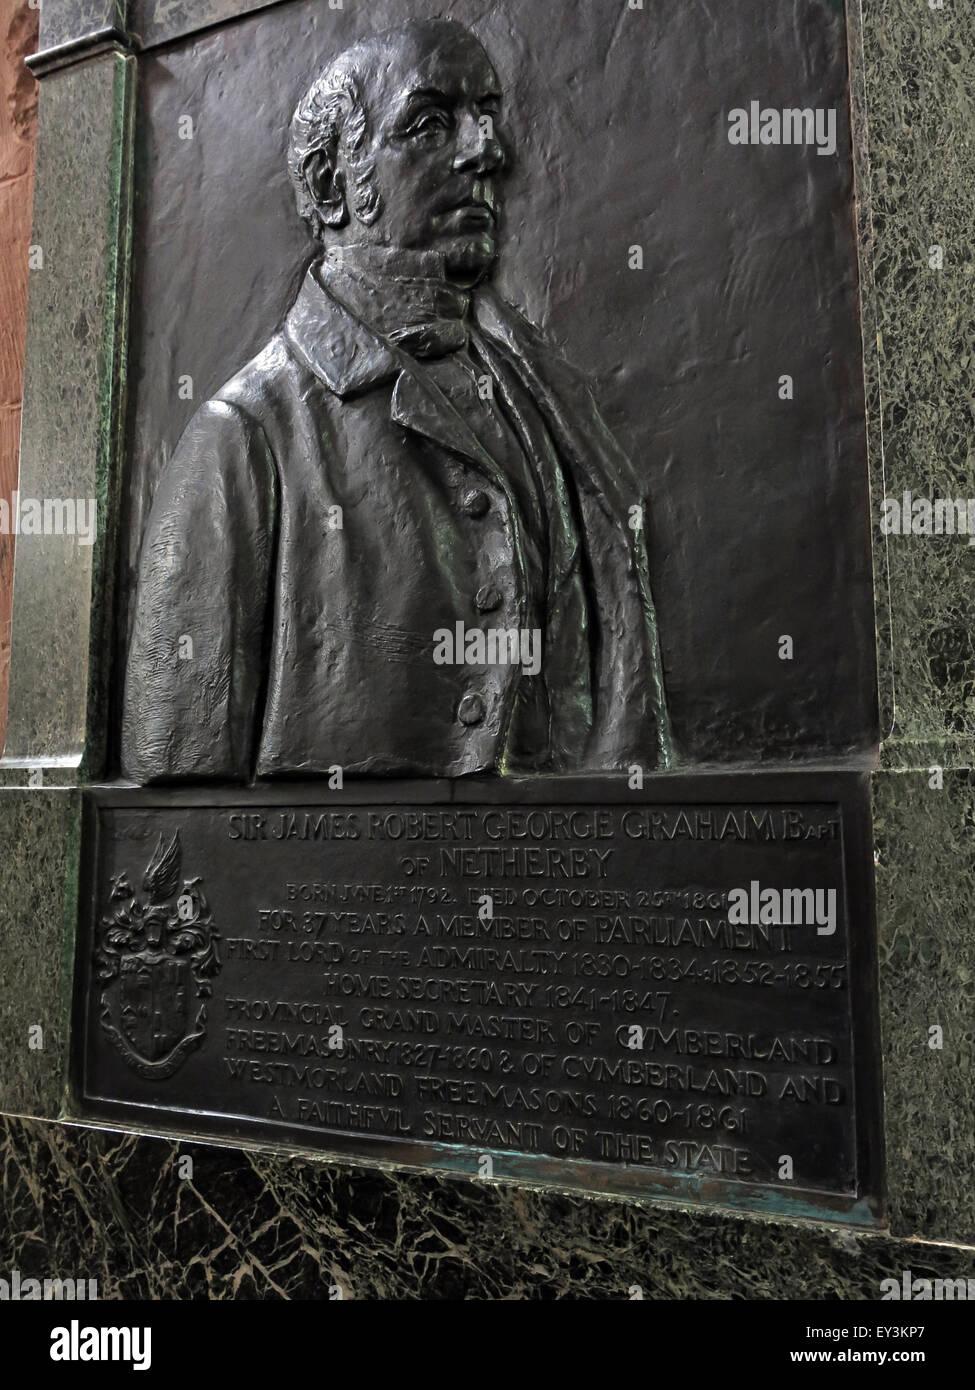 Laden Sie dieses Alamy Stockfoto 1860 Sir James Graham von John Tweed, Carlisle Kathedrale, Cumbria, England, UK - EY3KP7